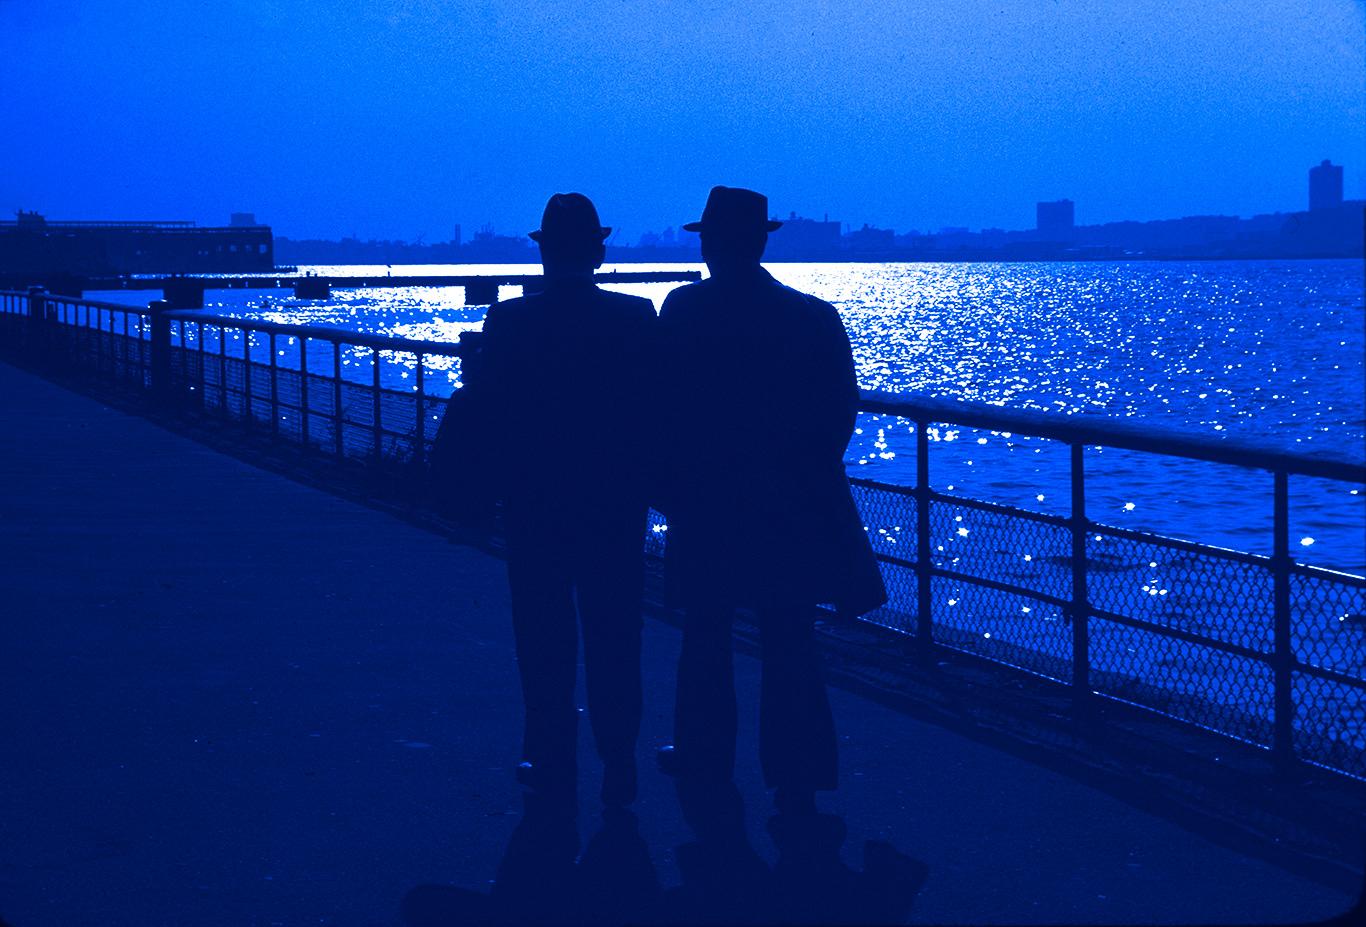 silhouette-of-two-men-blue-version-copy.jpg